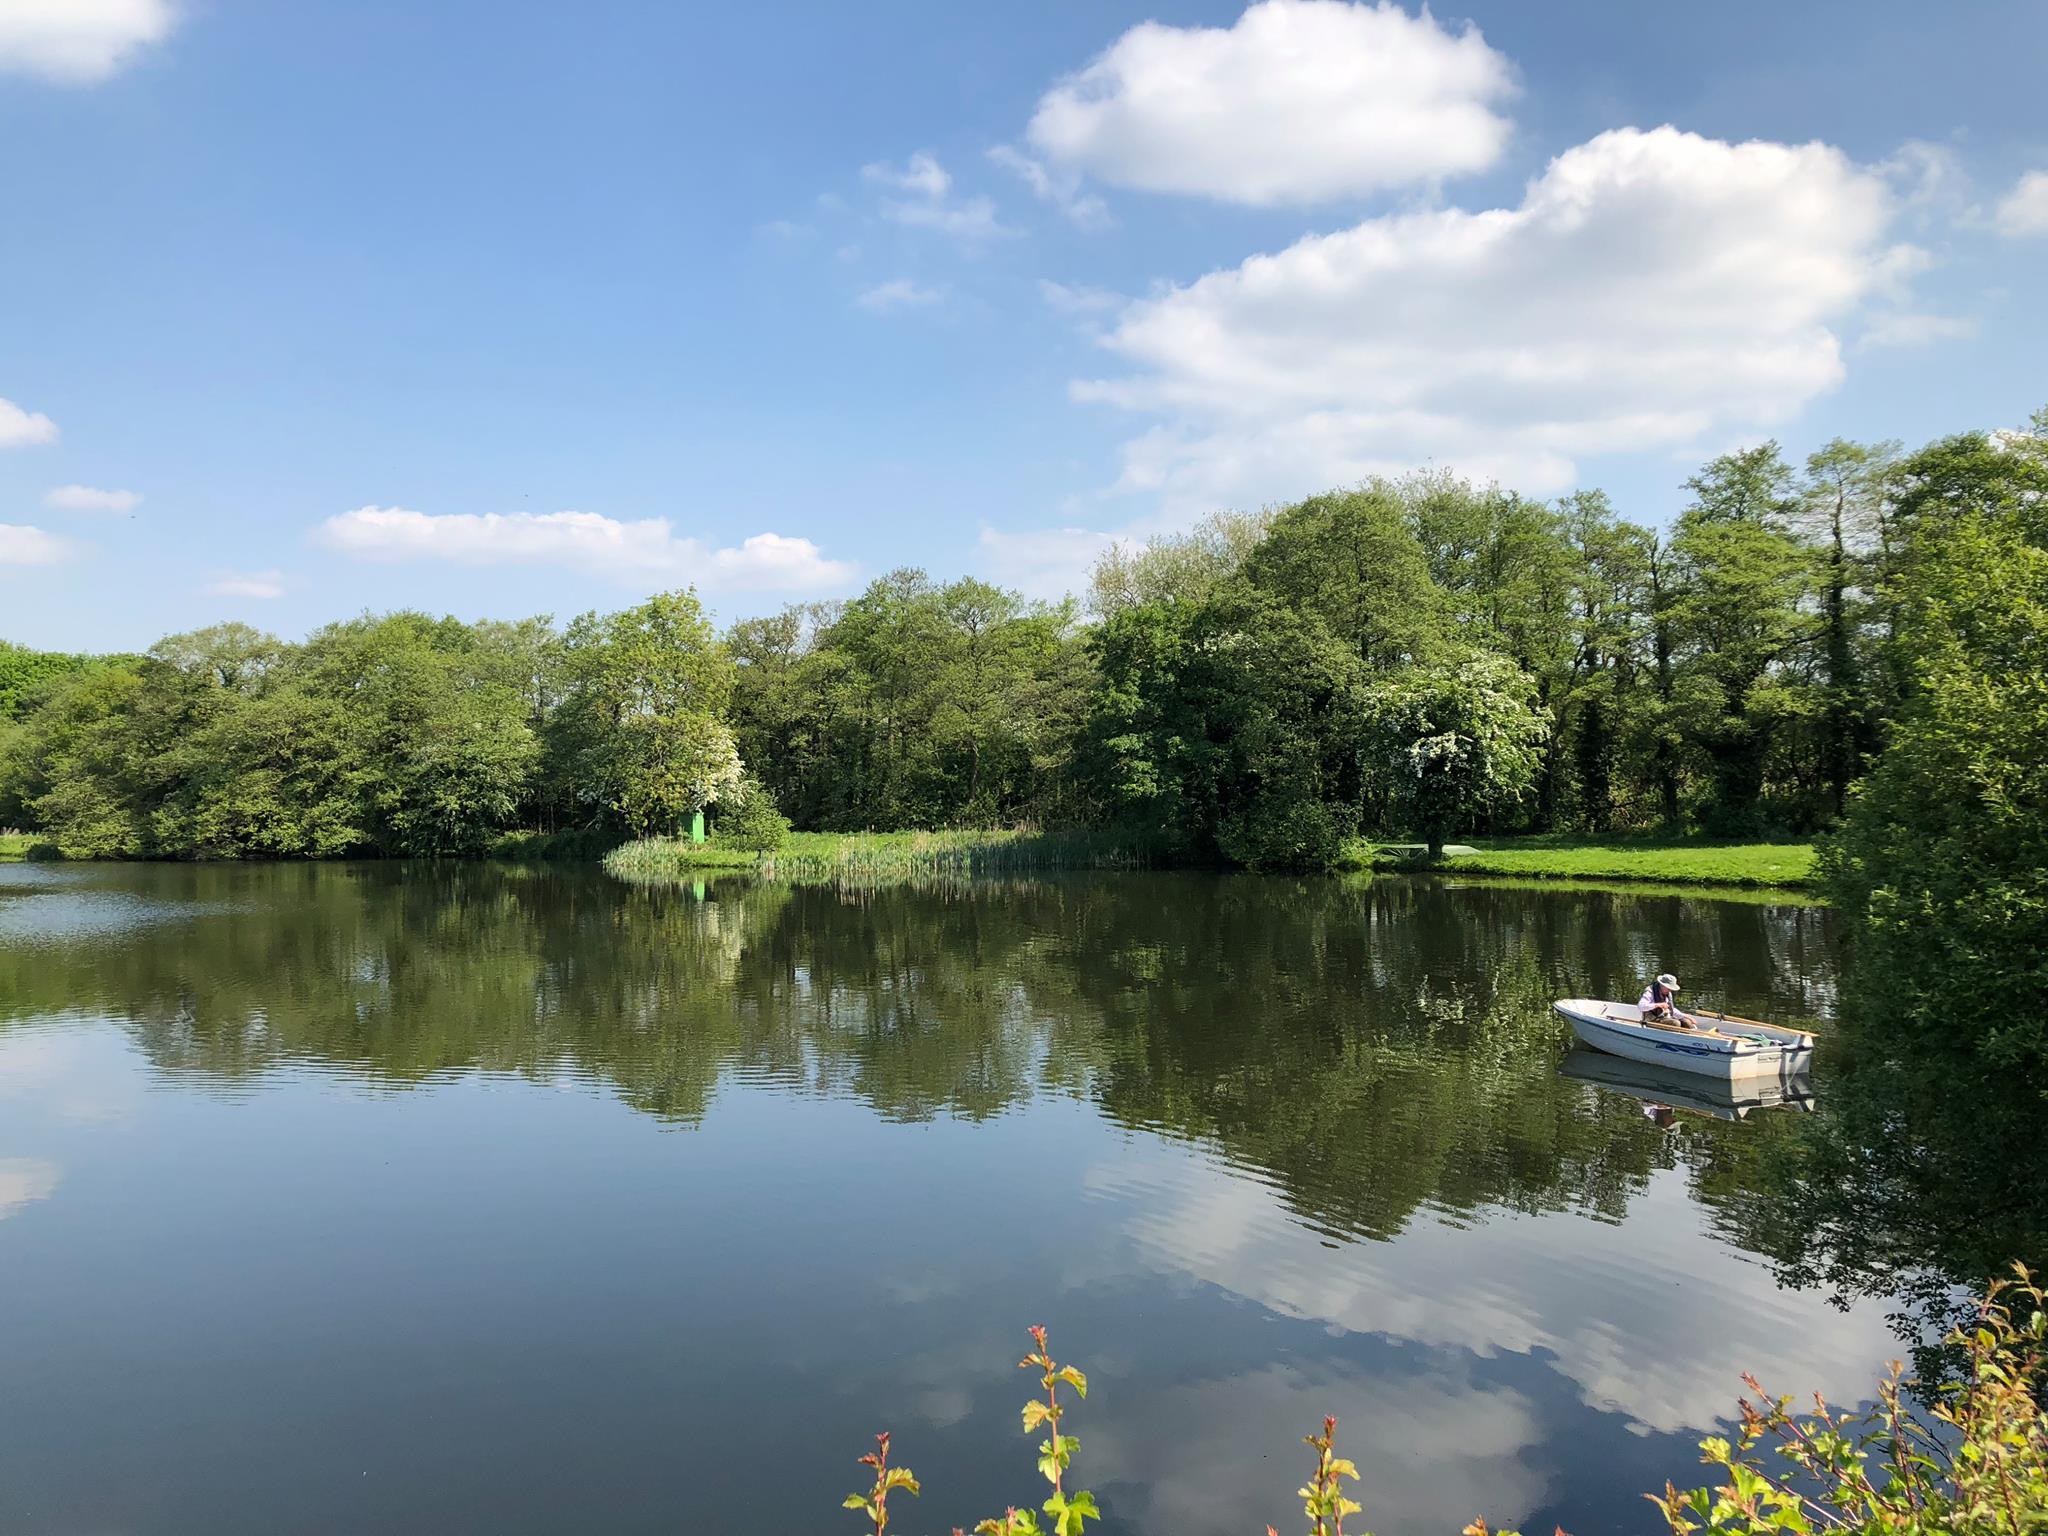 Barnt Green Fishing & Sailing Club